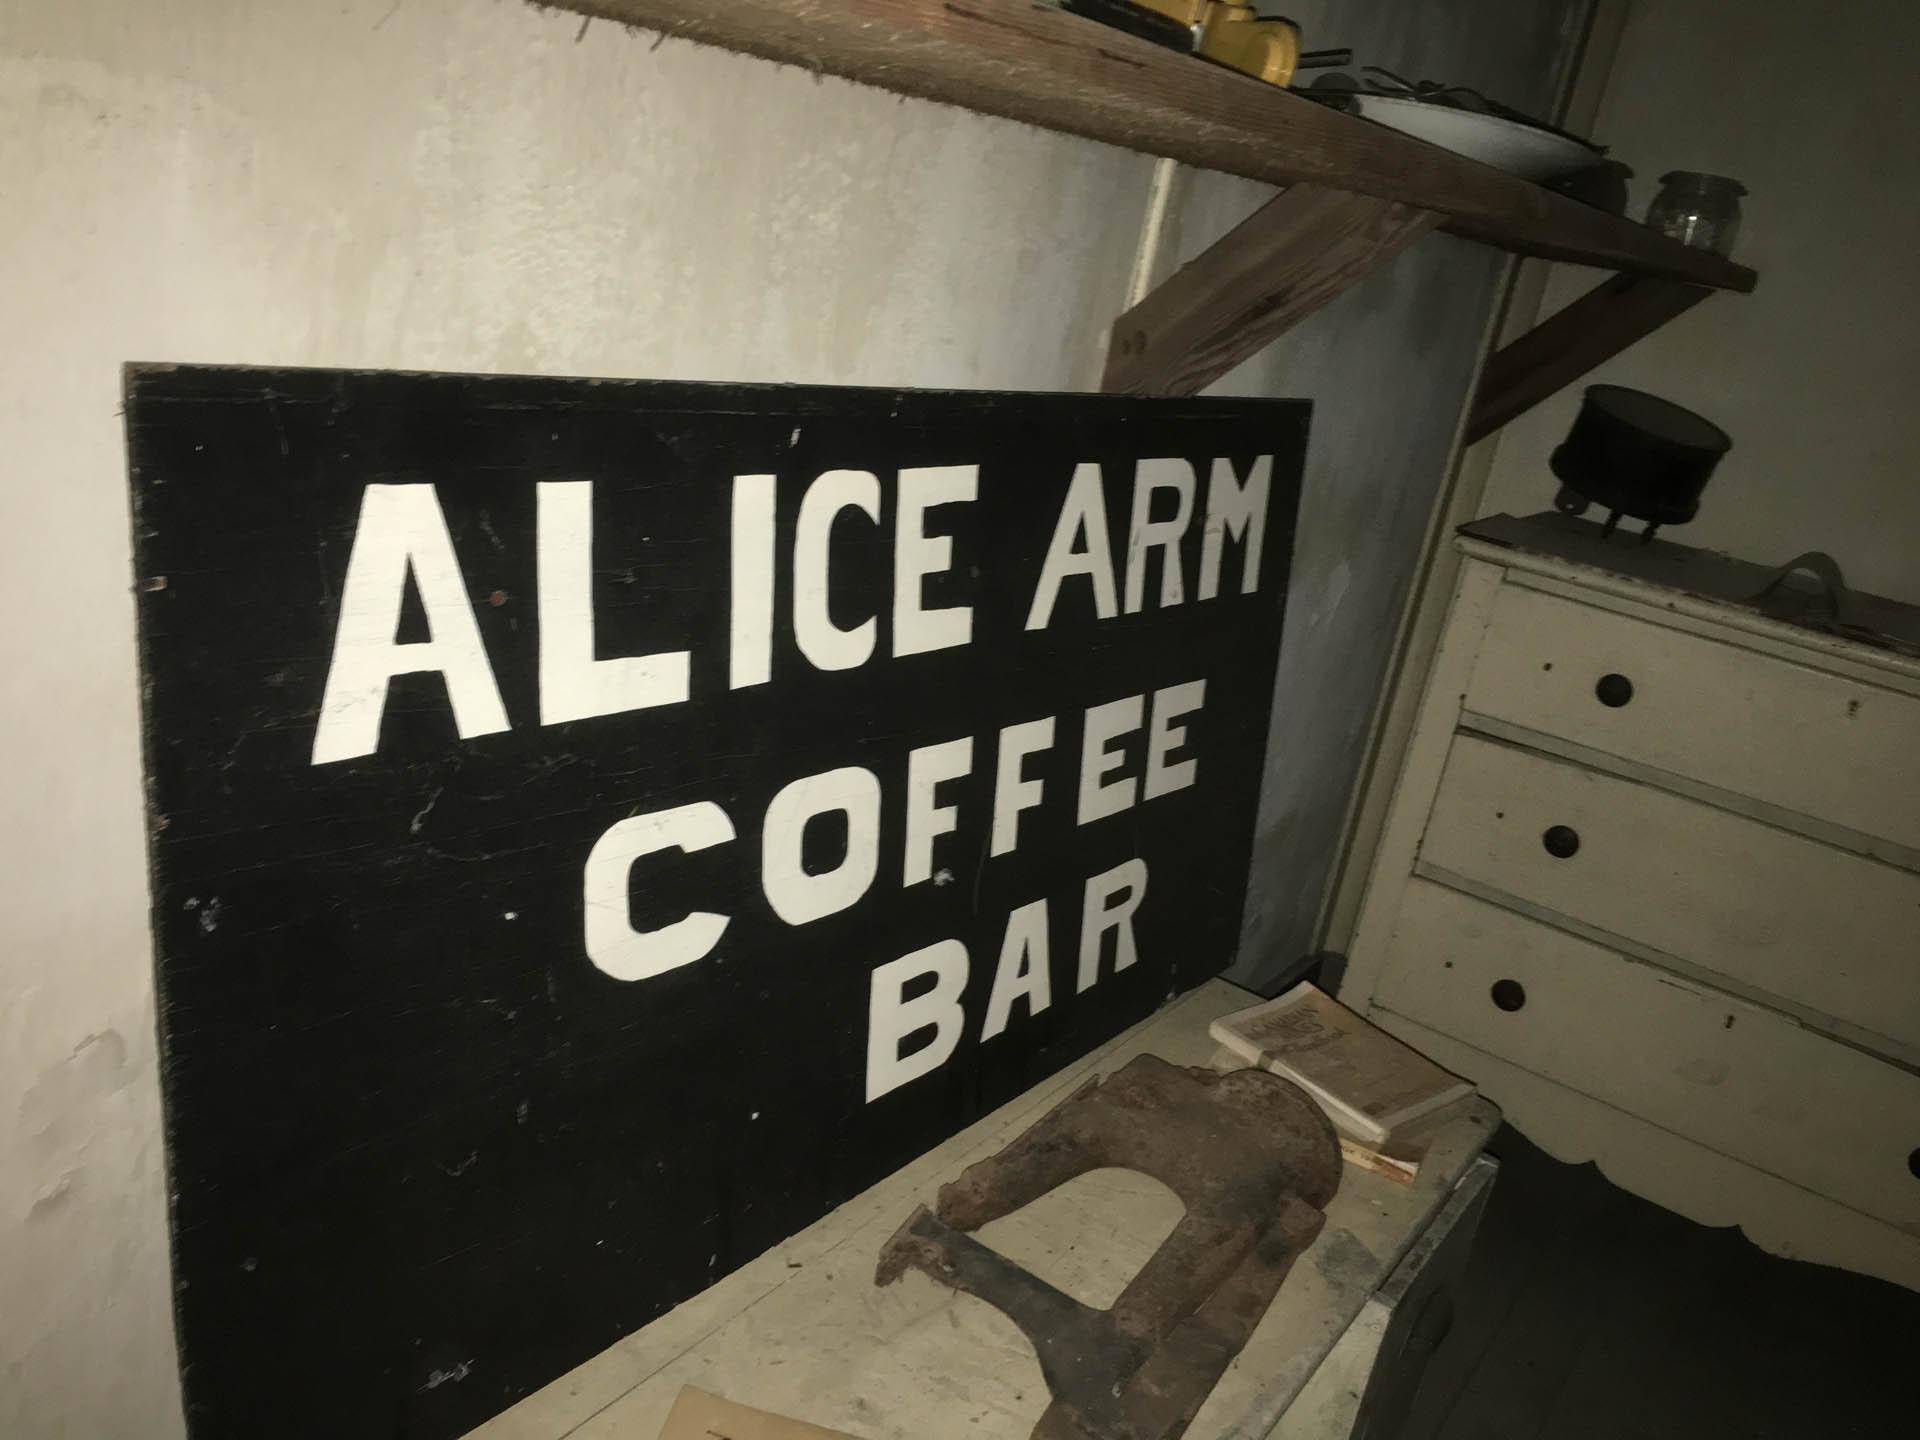 Alice Arm Coffee Bar